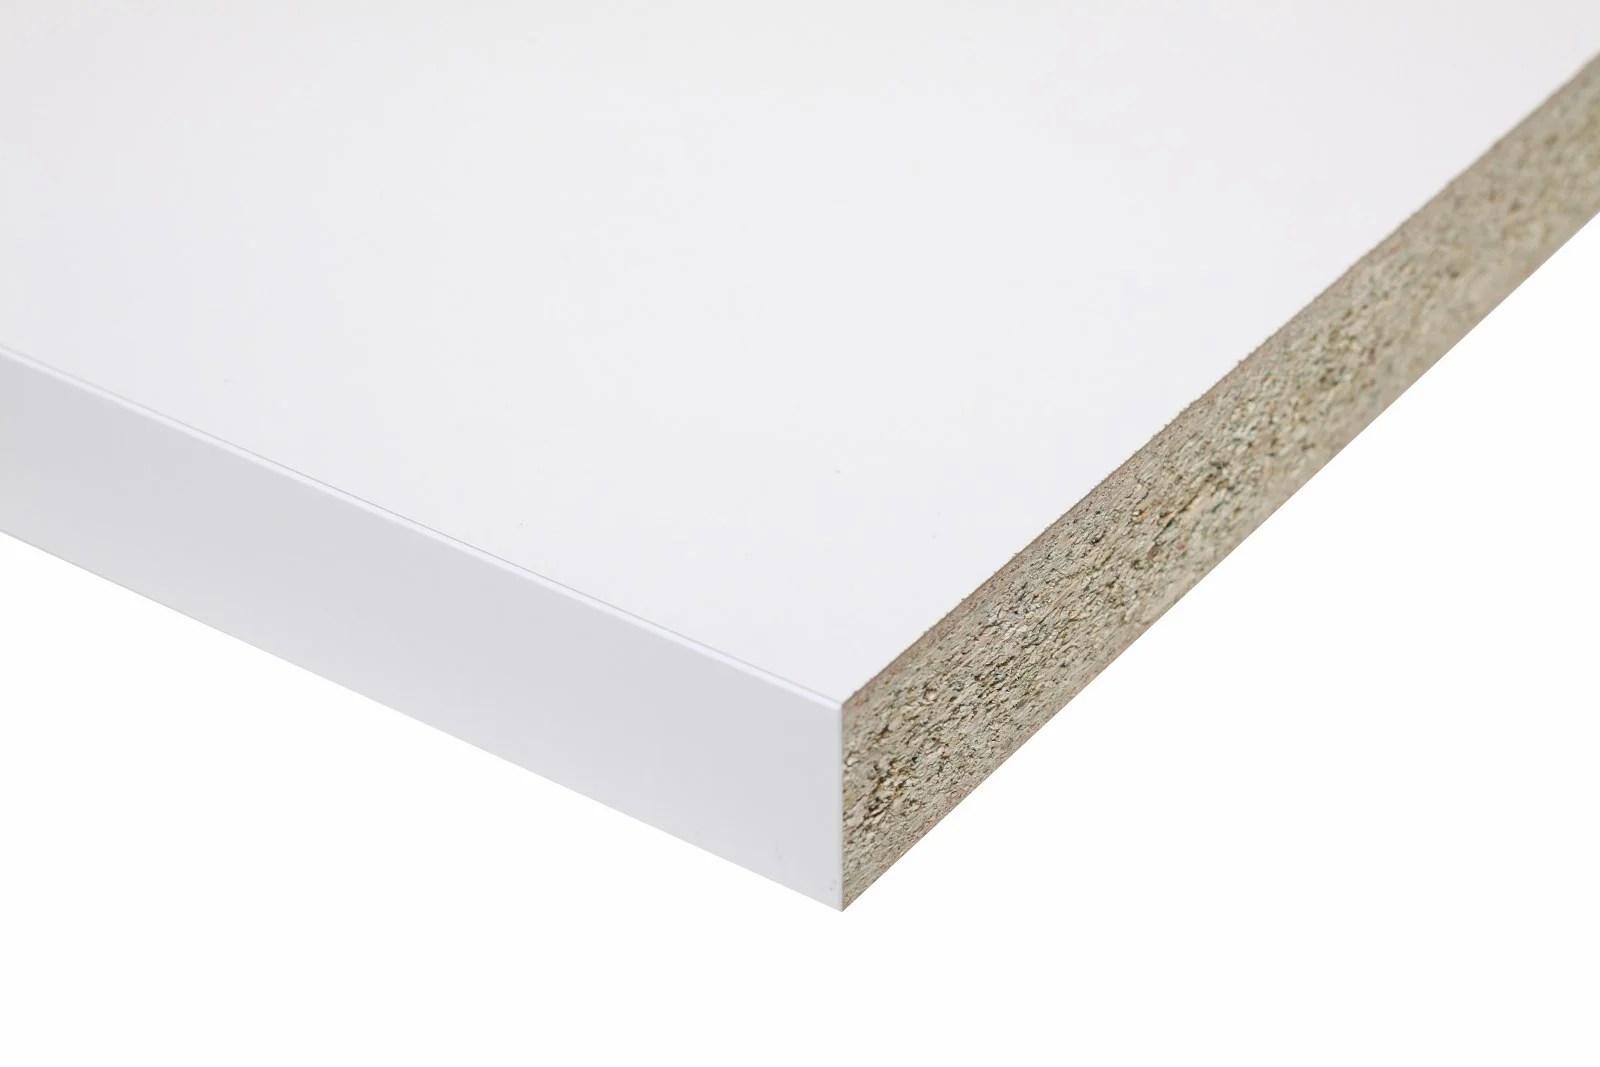 plan de travail stratifie blanc brillant l 315 x p 65 cm ep 38 mm